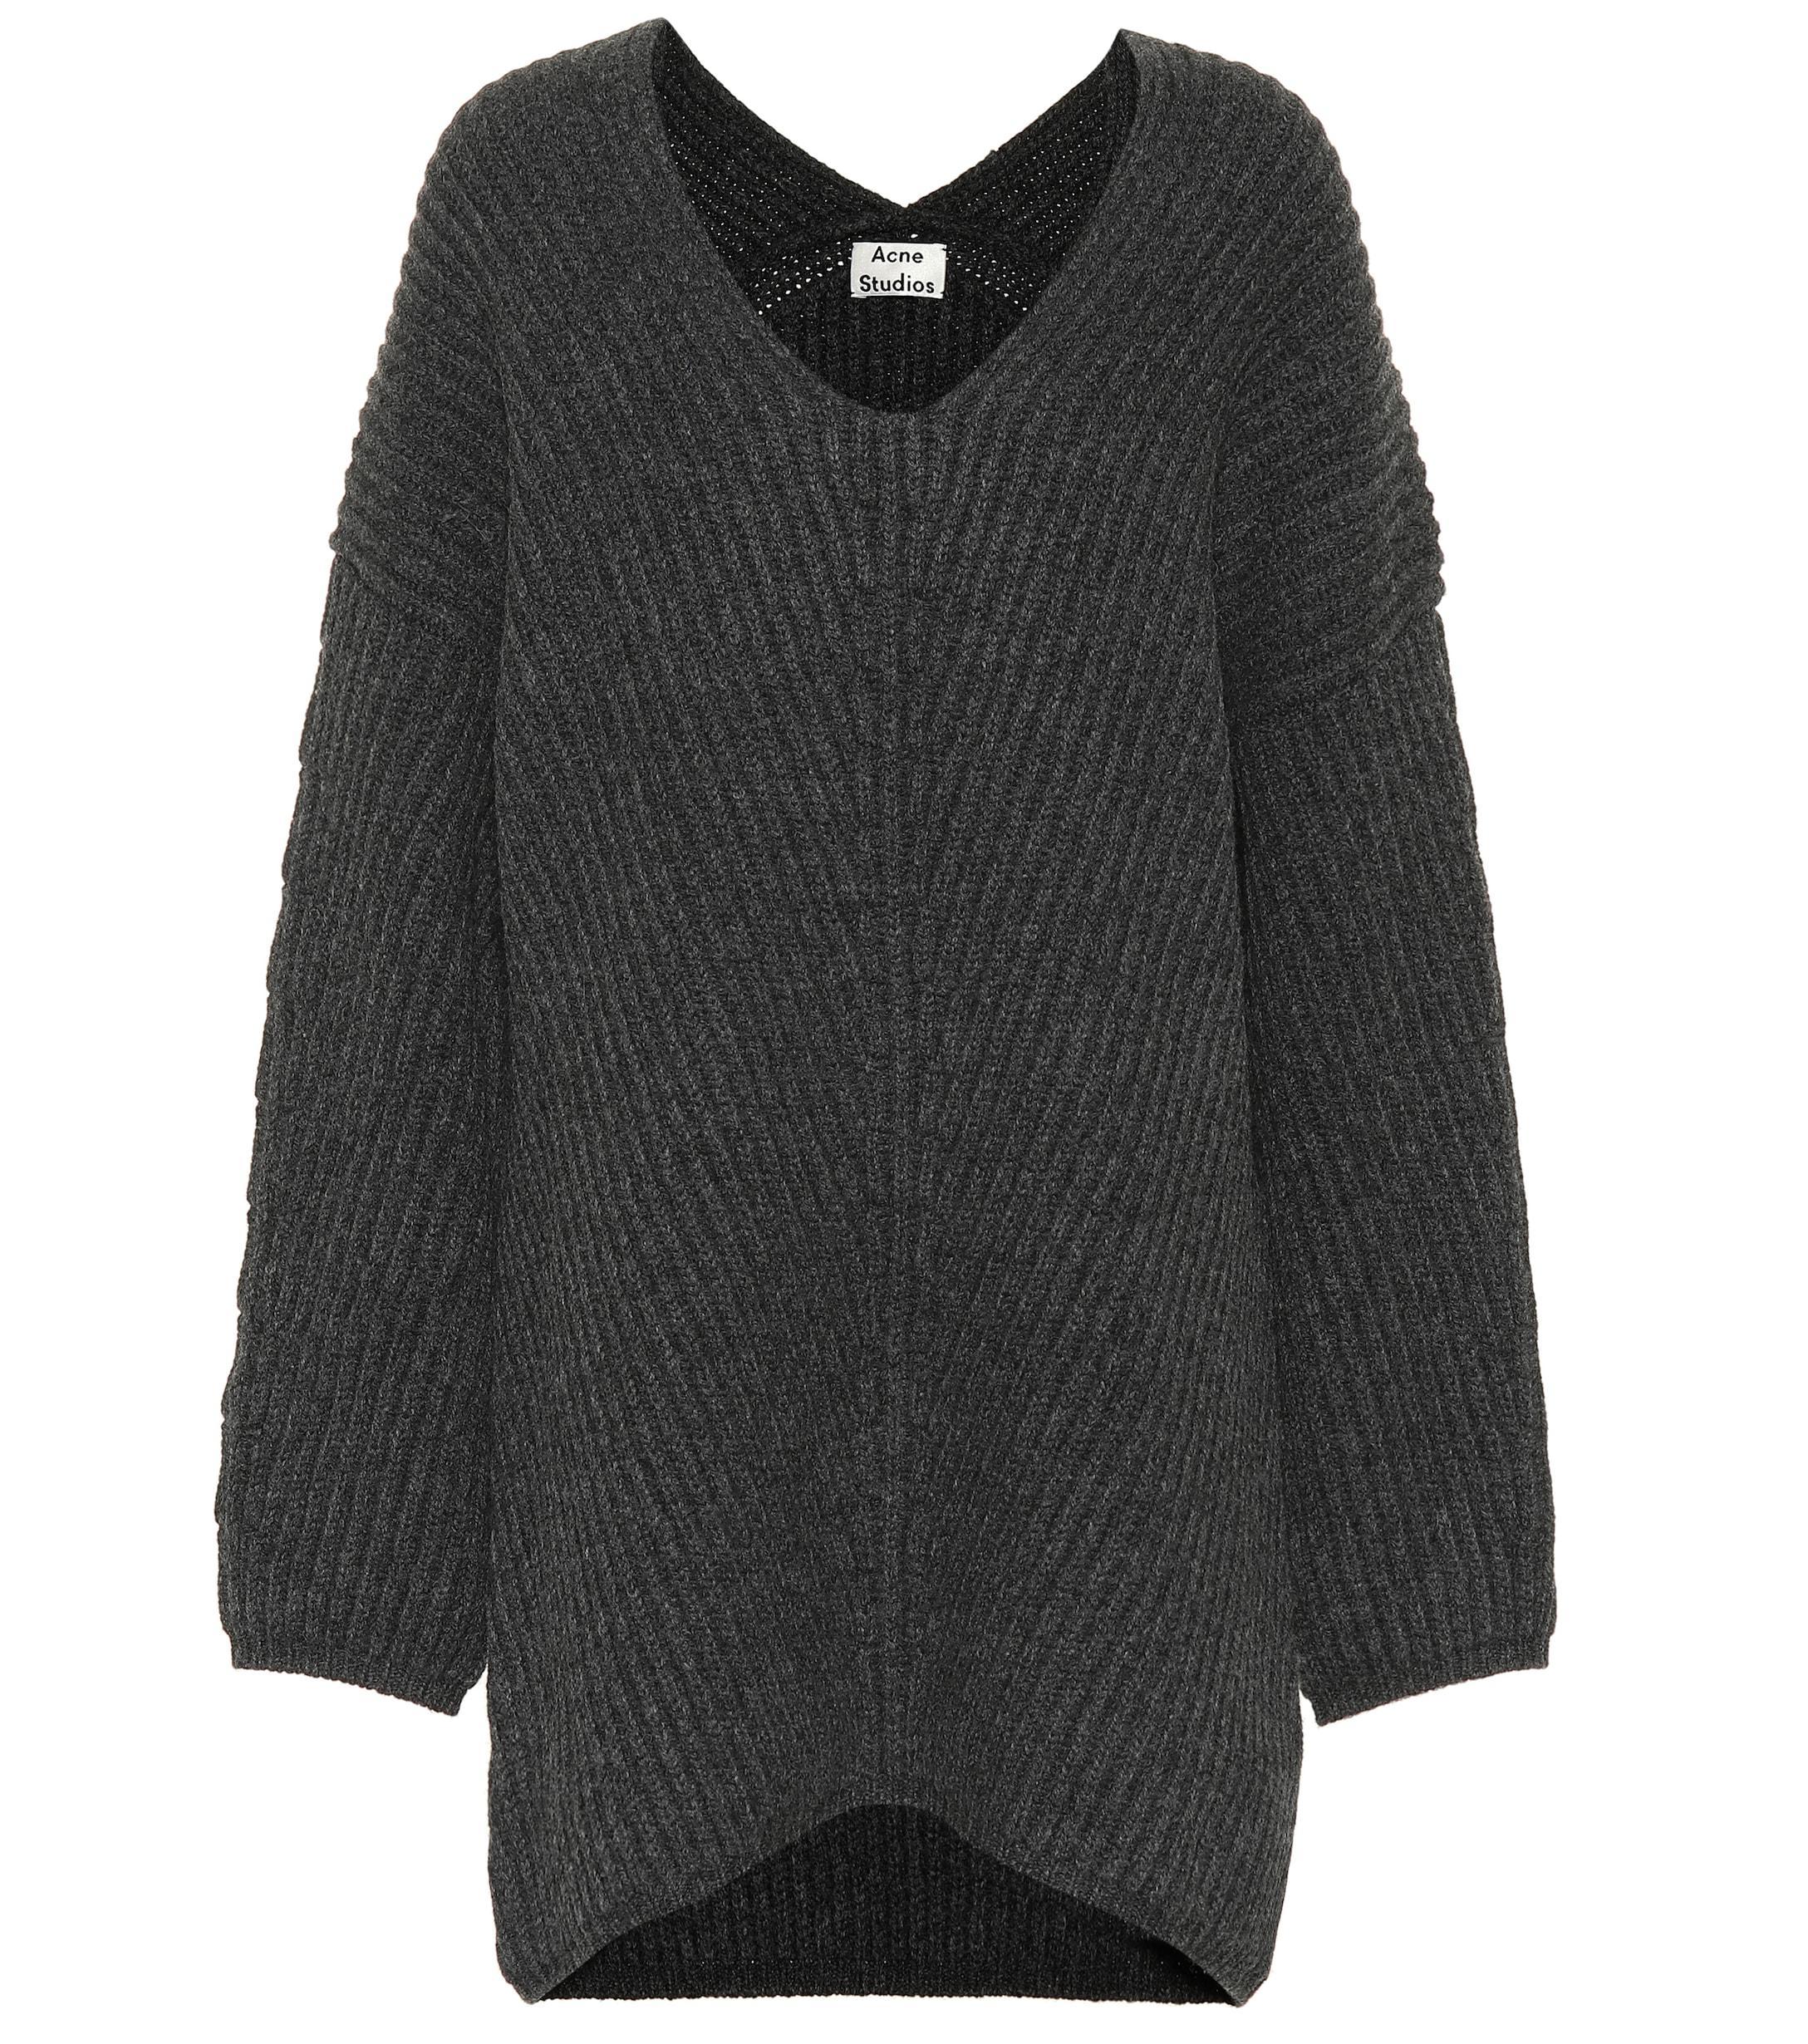 Acne - Gray Deka Clean Wool Sweater - Lyst. View fullscreen b551b4369